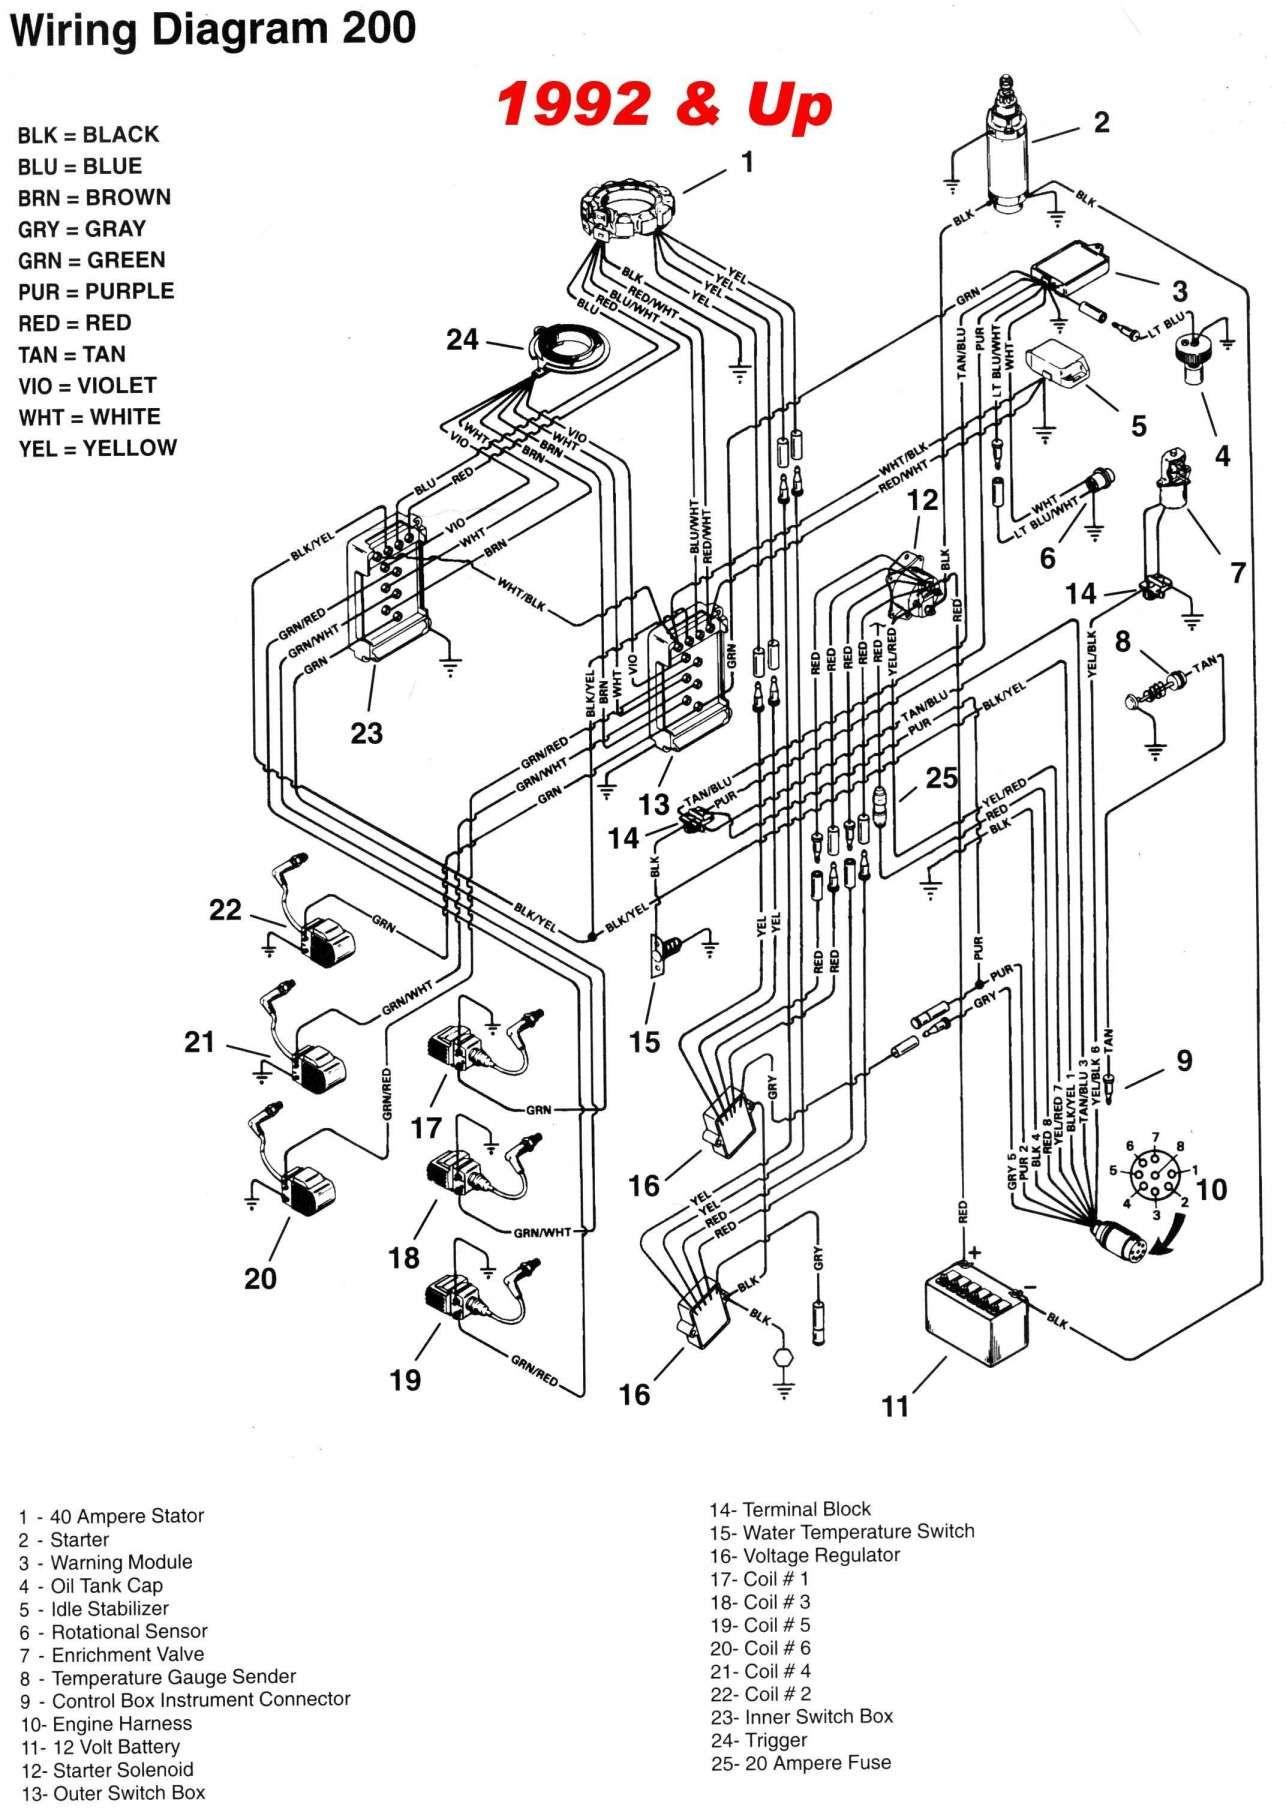 Mercruiser 140 Engine Wiring Diagram And Civic Ignition Wiring Diagram Diagrams Instructions In 2020 Diagram Mercury Outboard Mercury